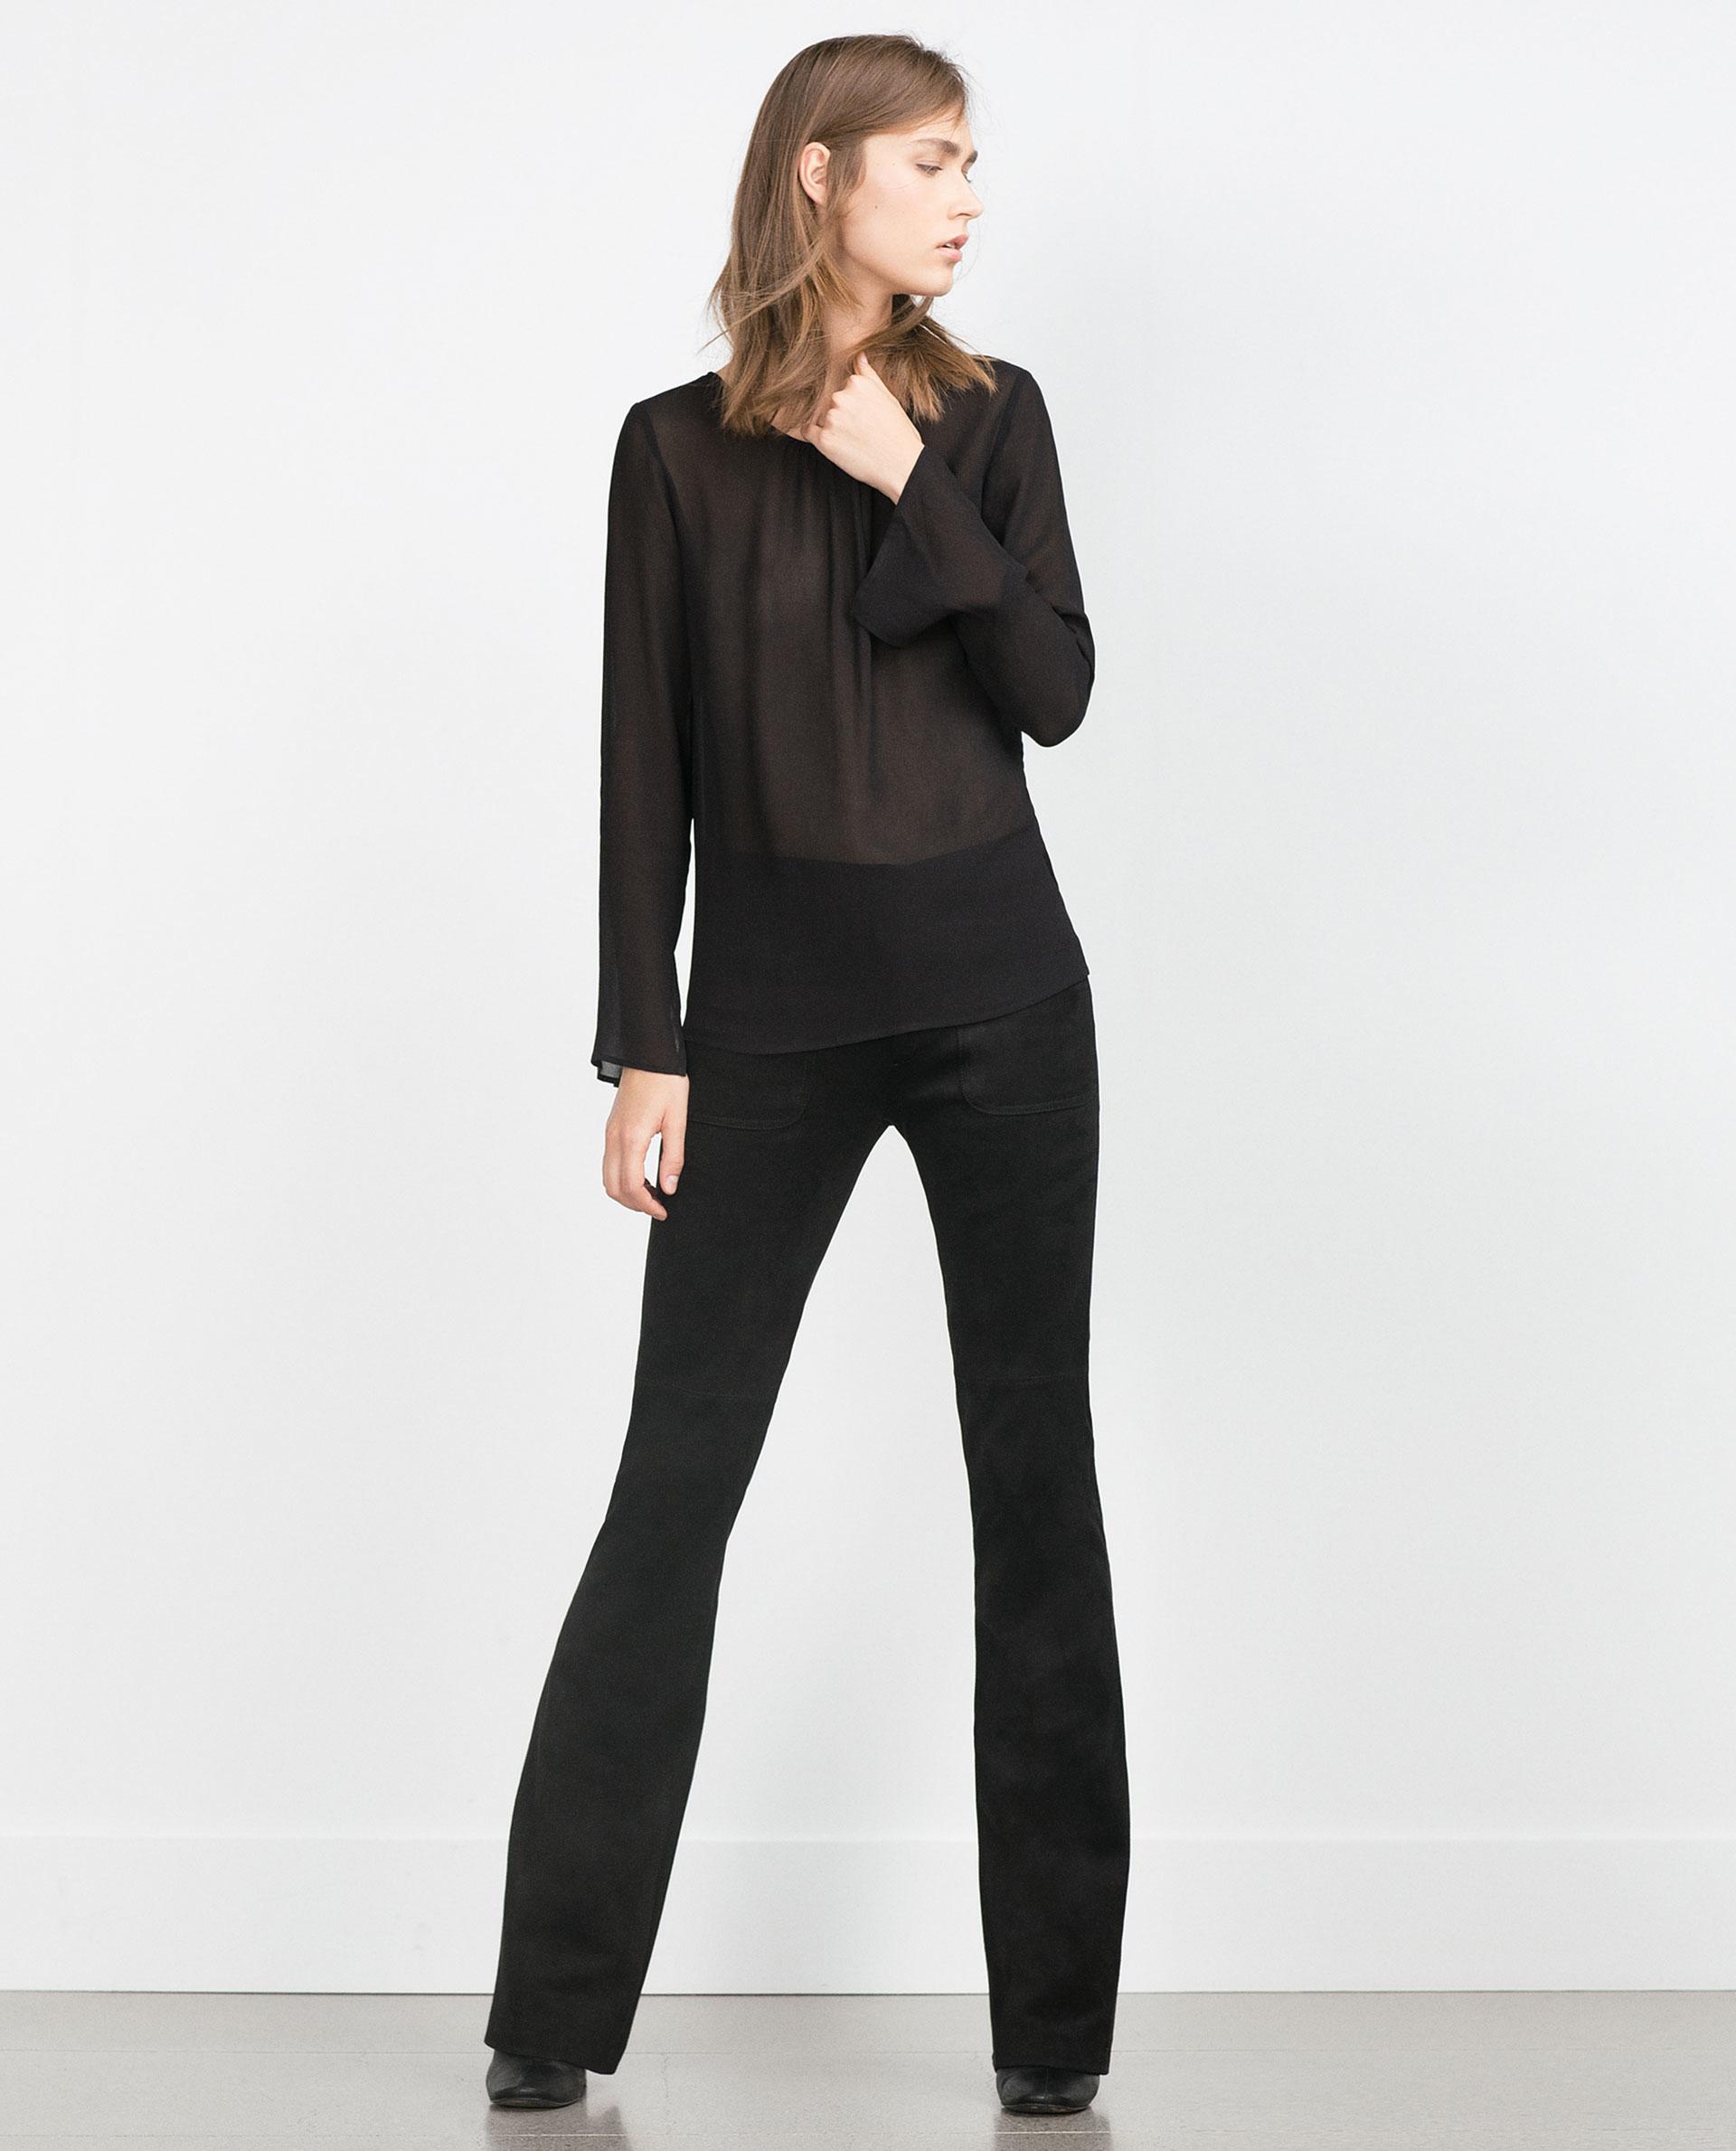 Zara Backless Blouse 11